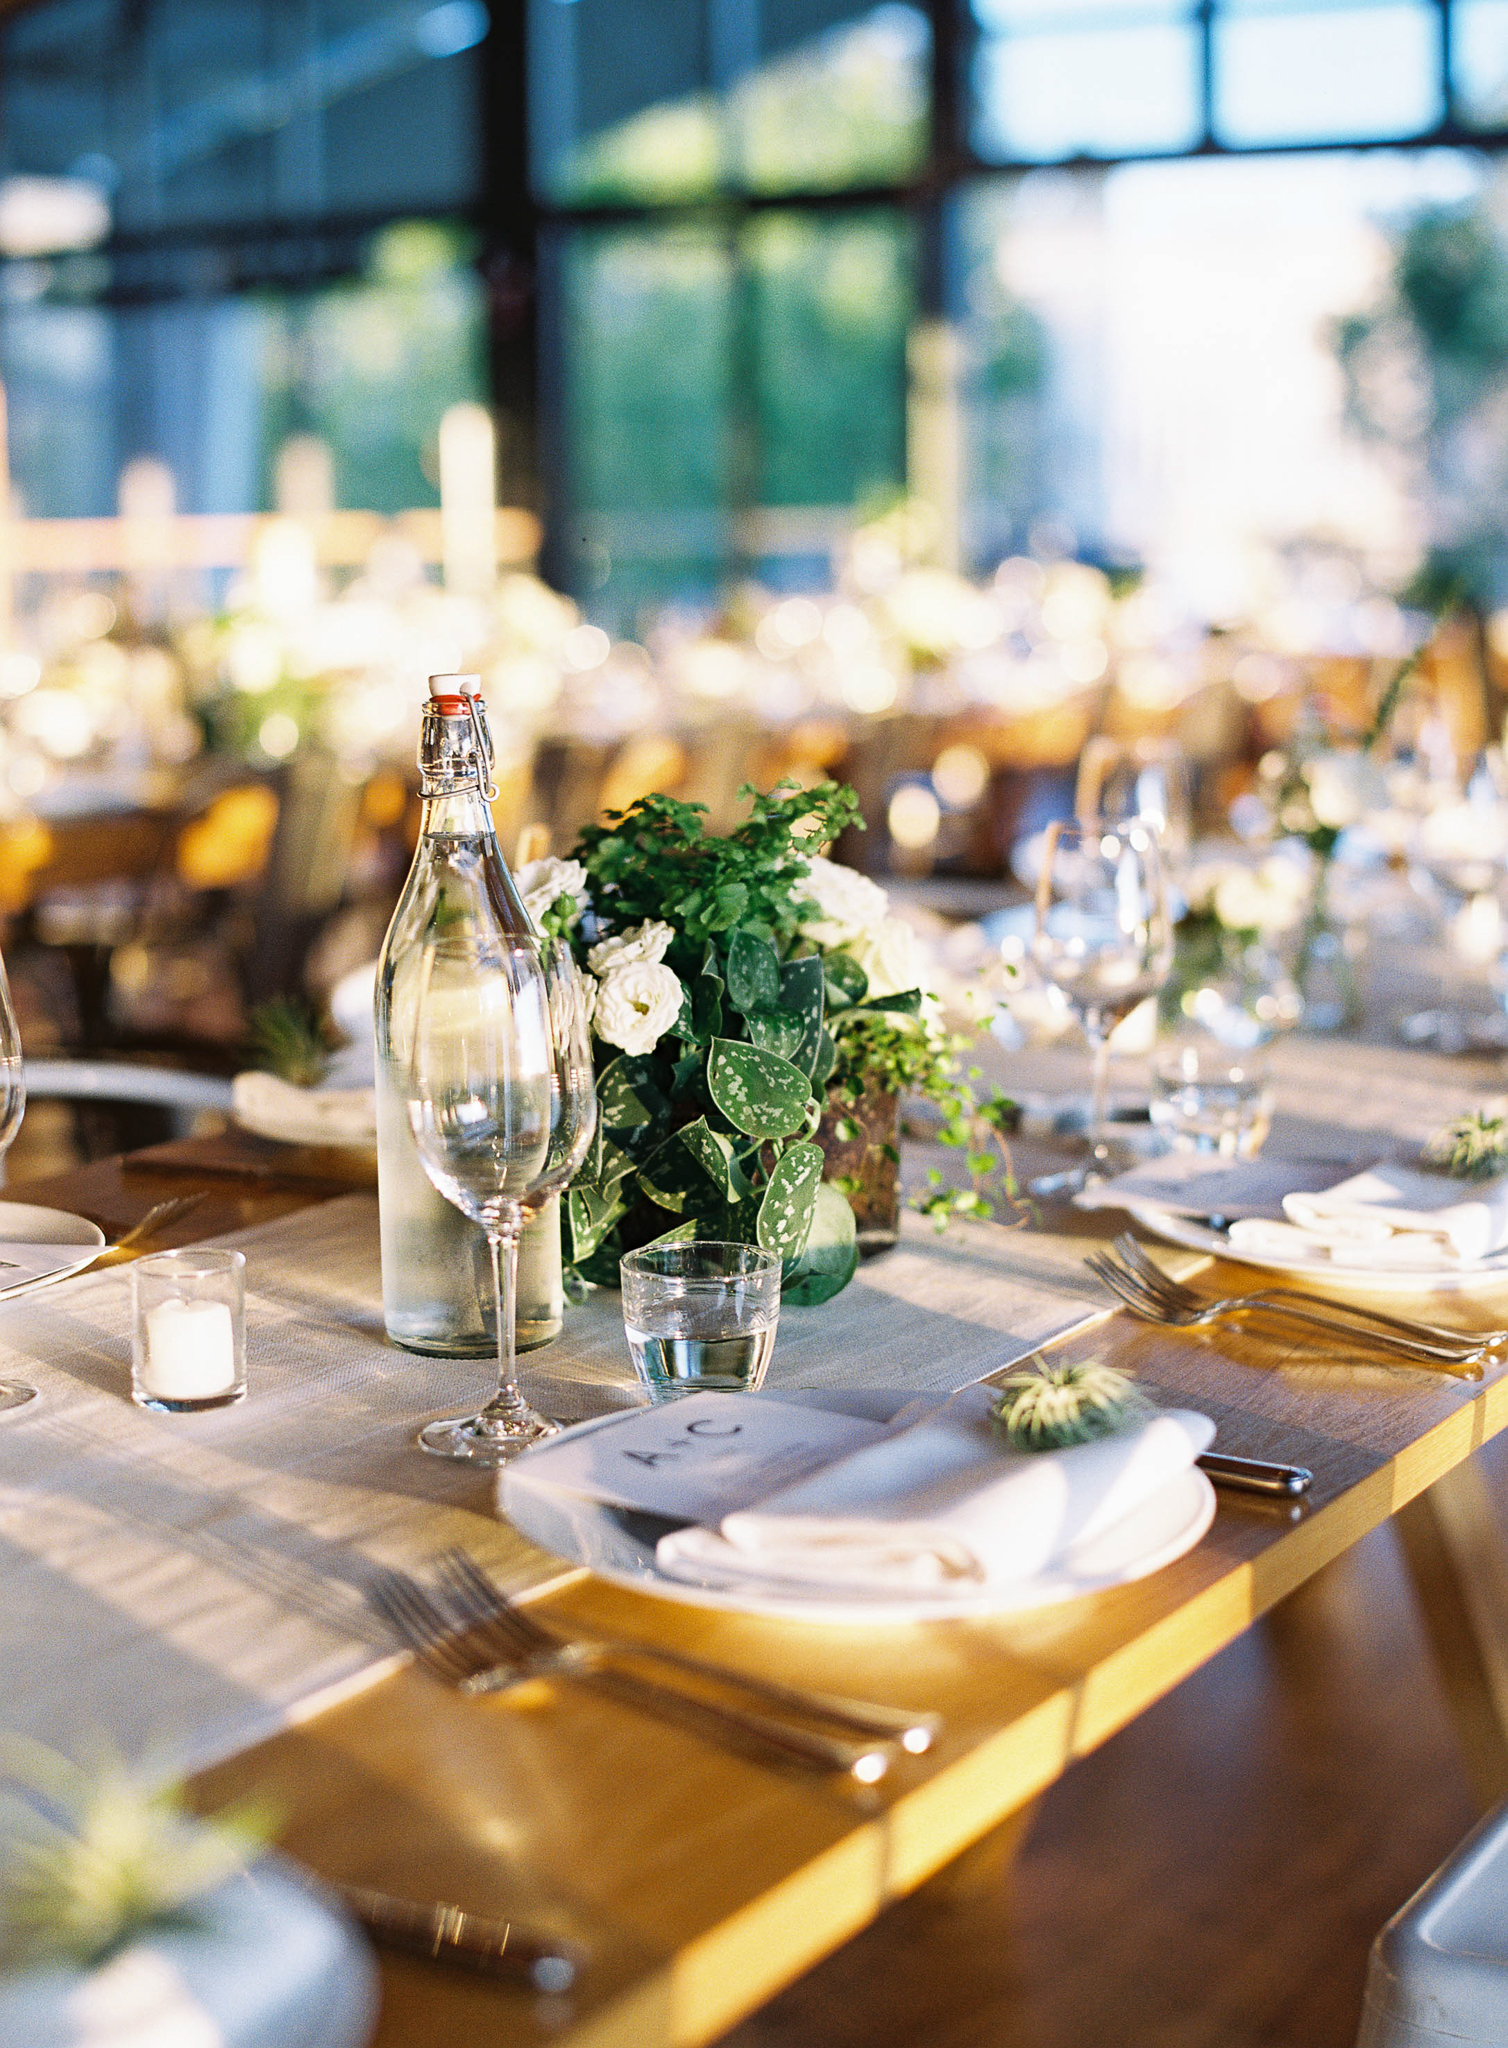 Meghan Mehan Photography - Fine Art Film Wedding Photography - San Francisco   Napa   Sonoma   Big Sur   Chicago   Minneapolis   Milwaukee   Lake Geneva   Door County   Wisconsin 071.jpg